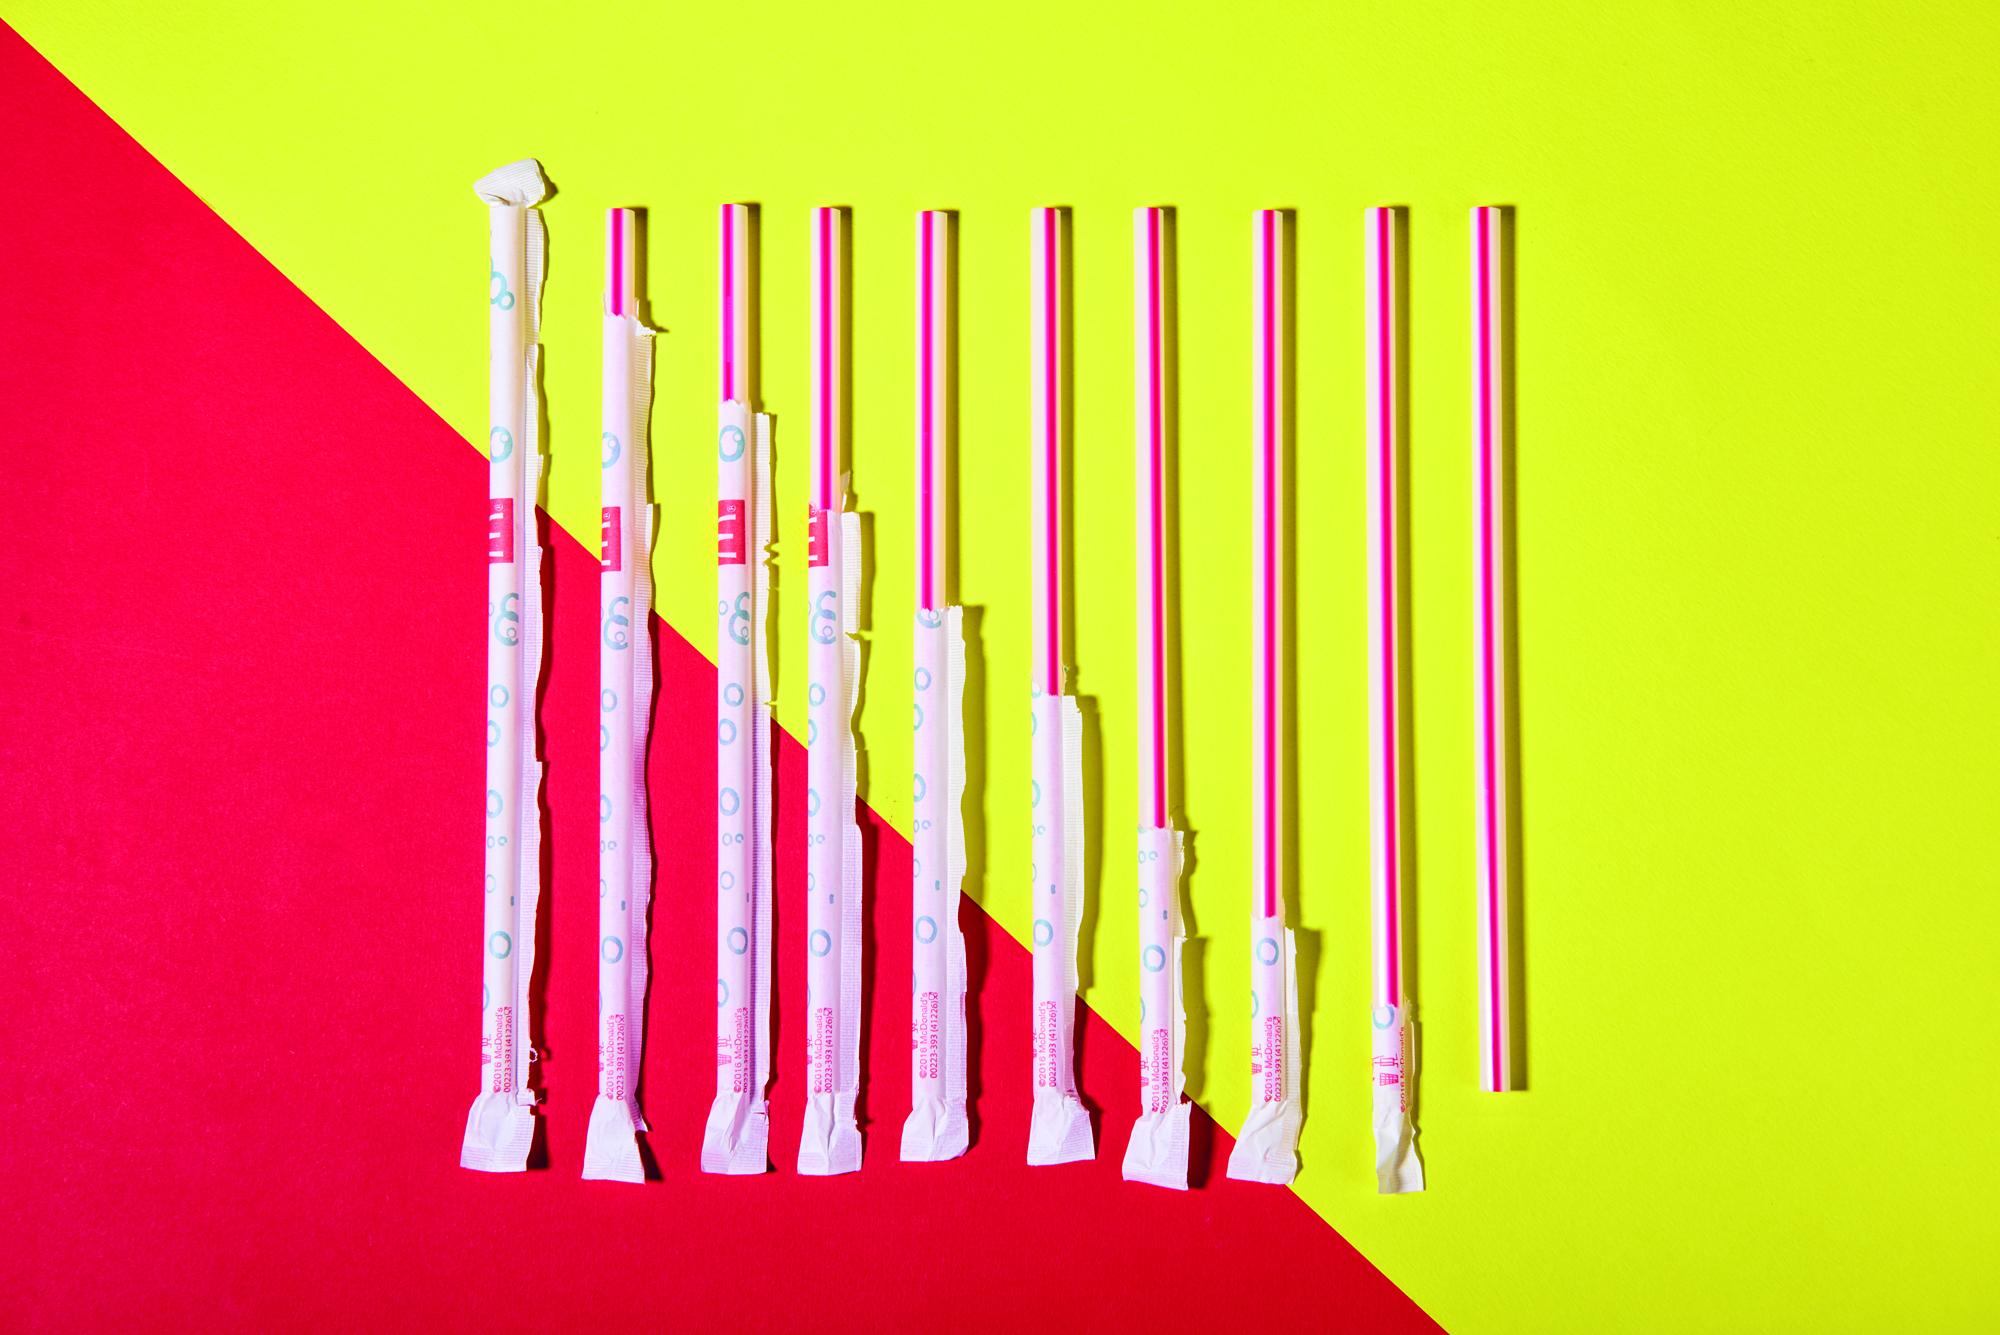 Annabel Staff McDonalds straws